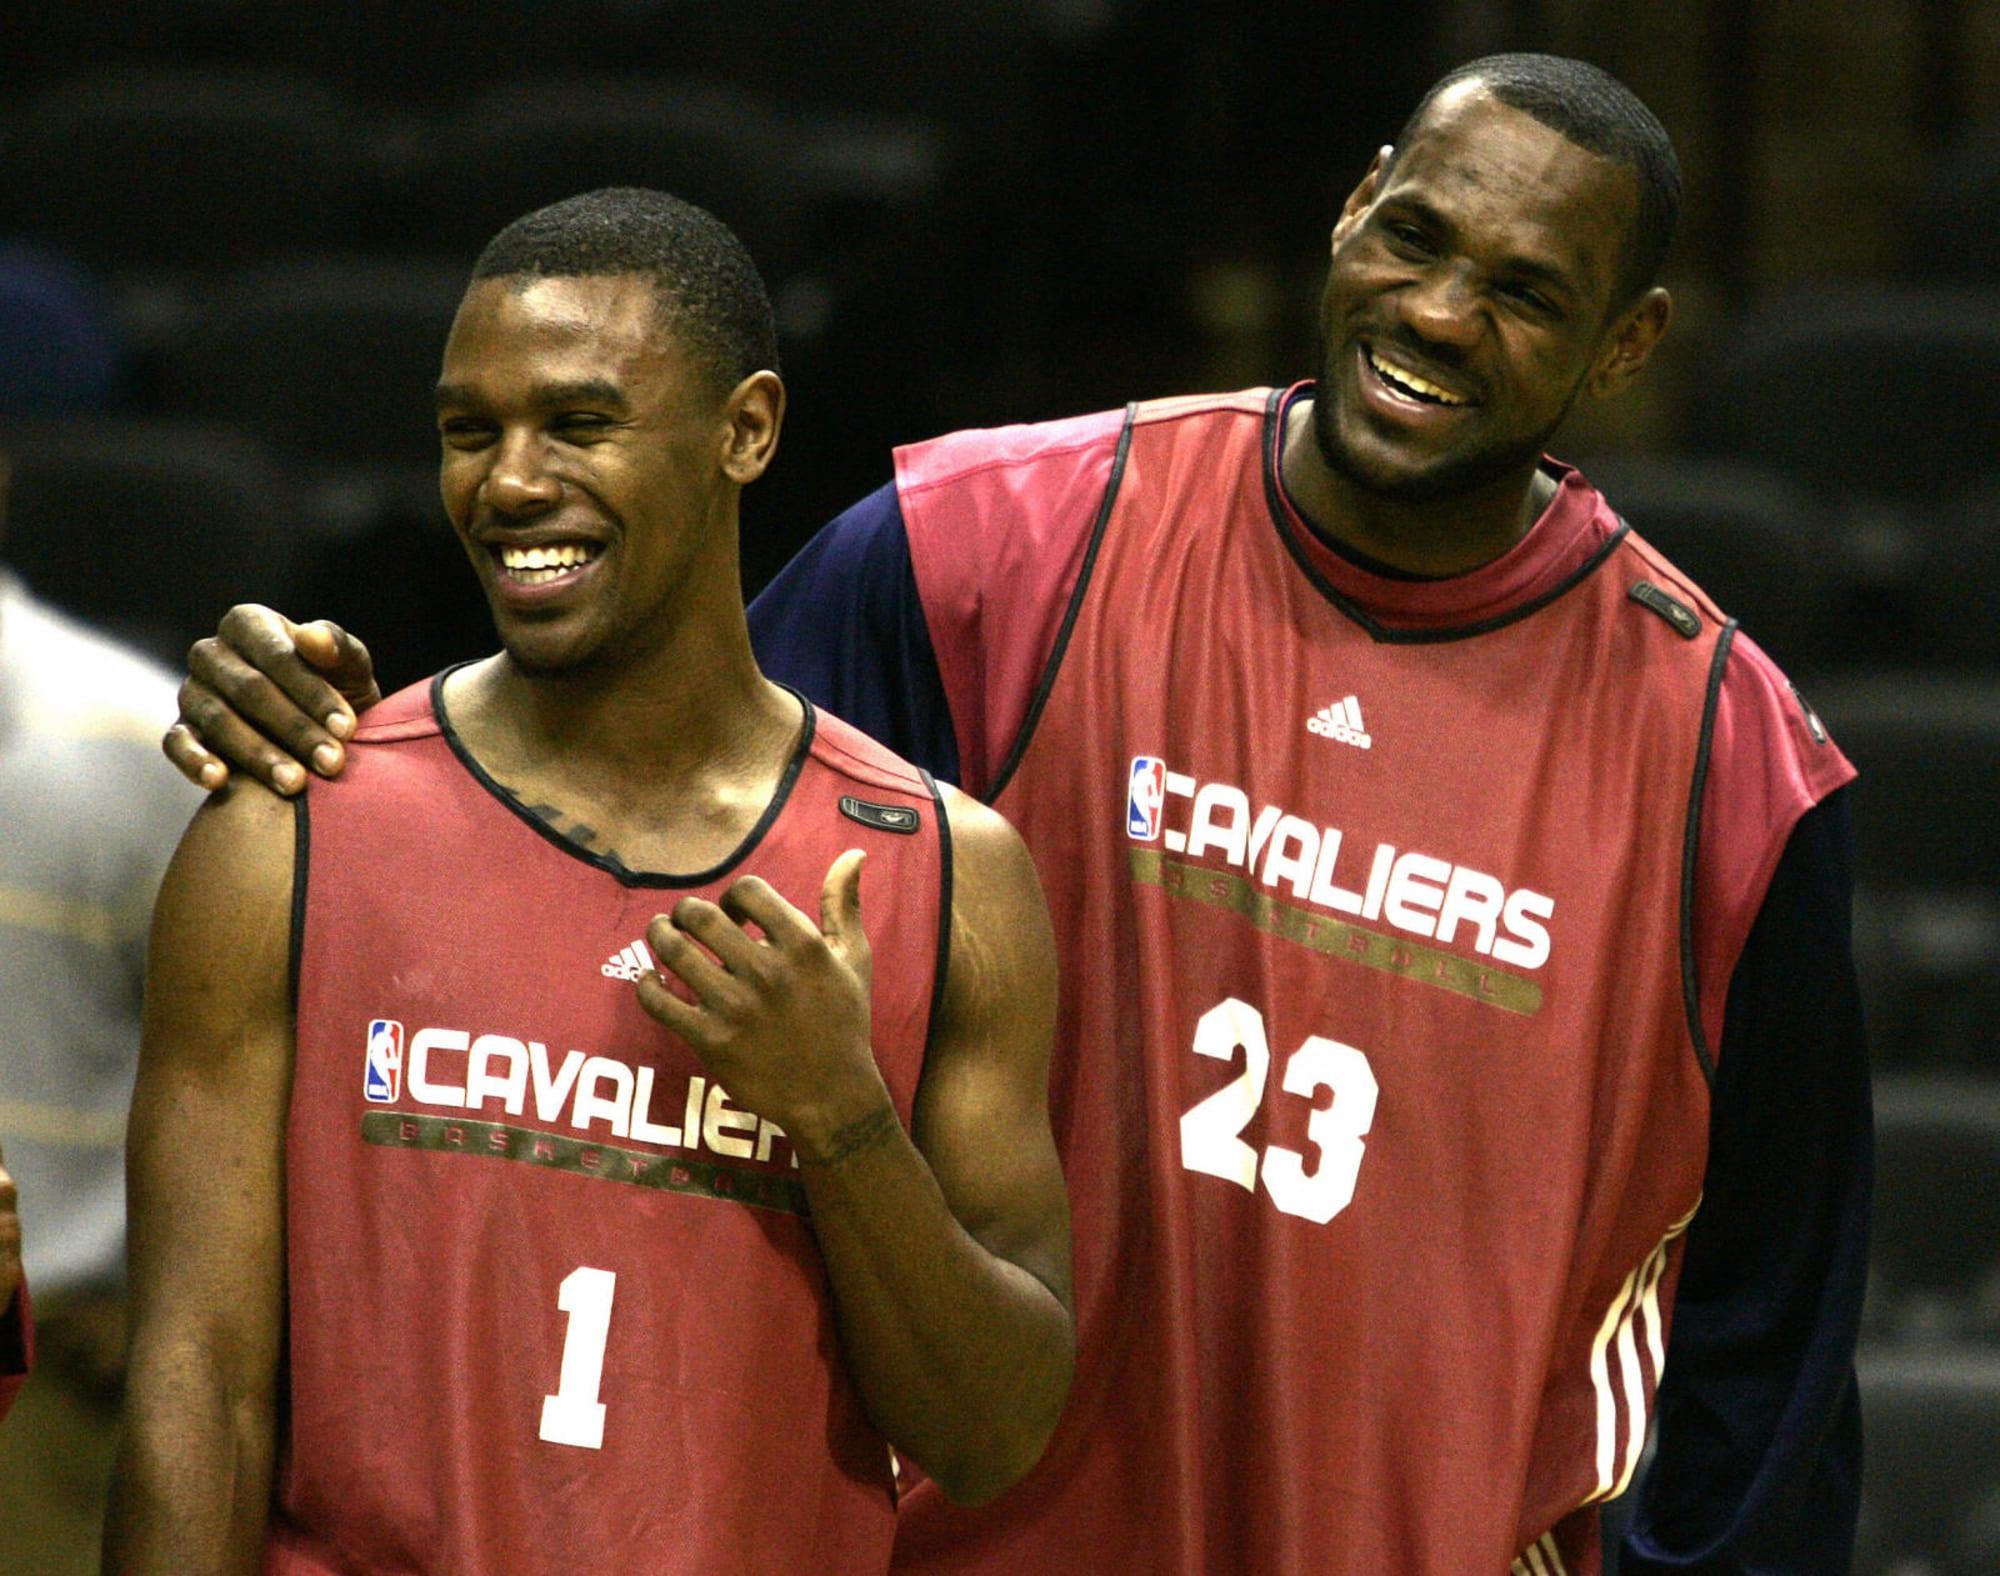 LeBron James' unreal Game 5 of 2007 ECF